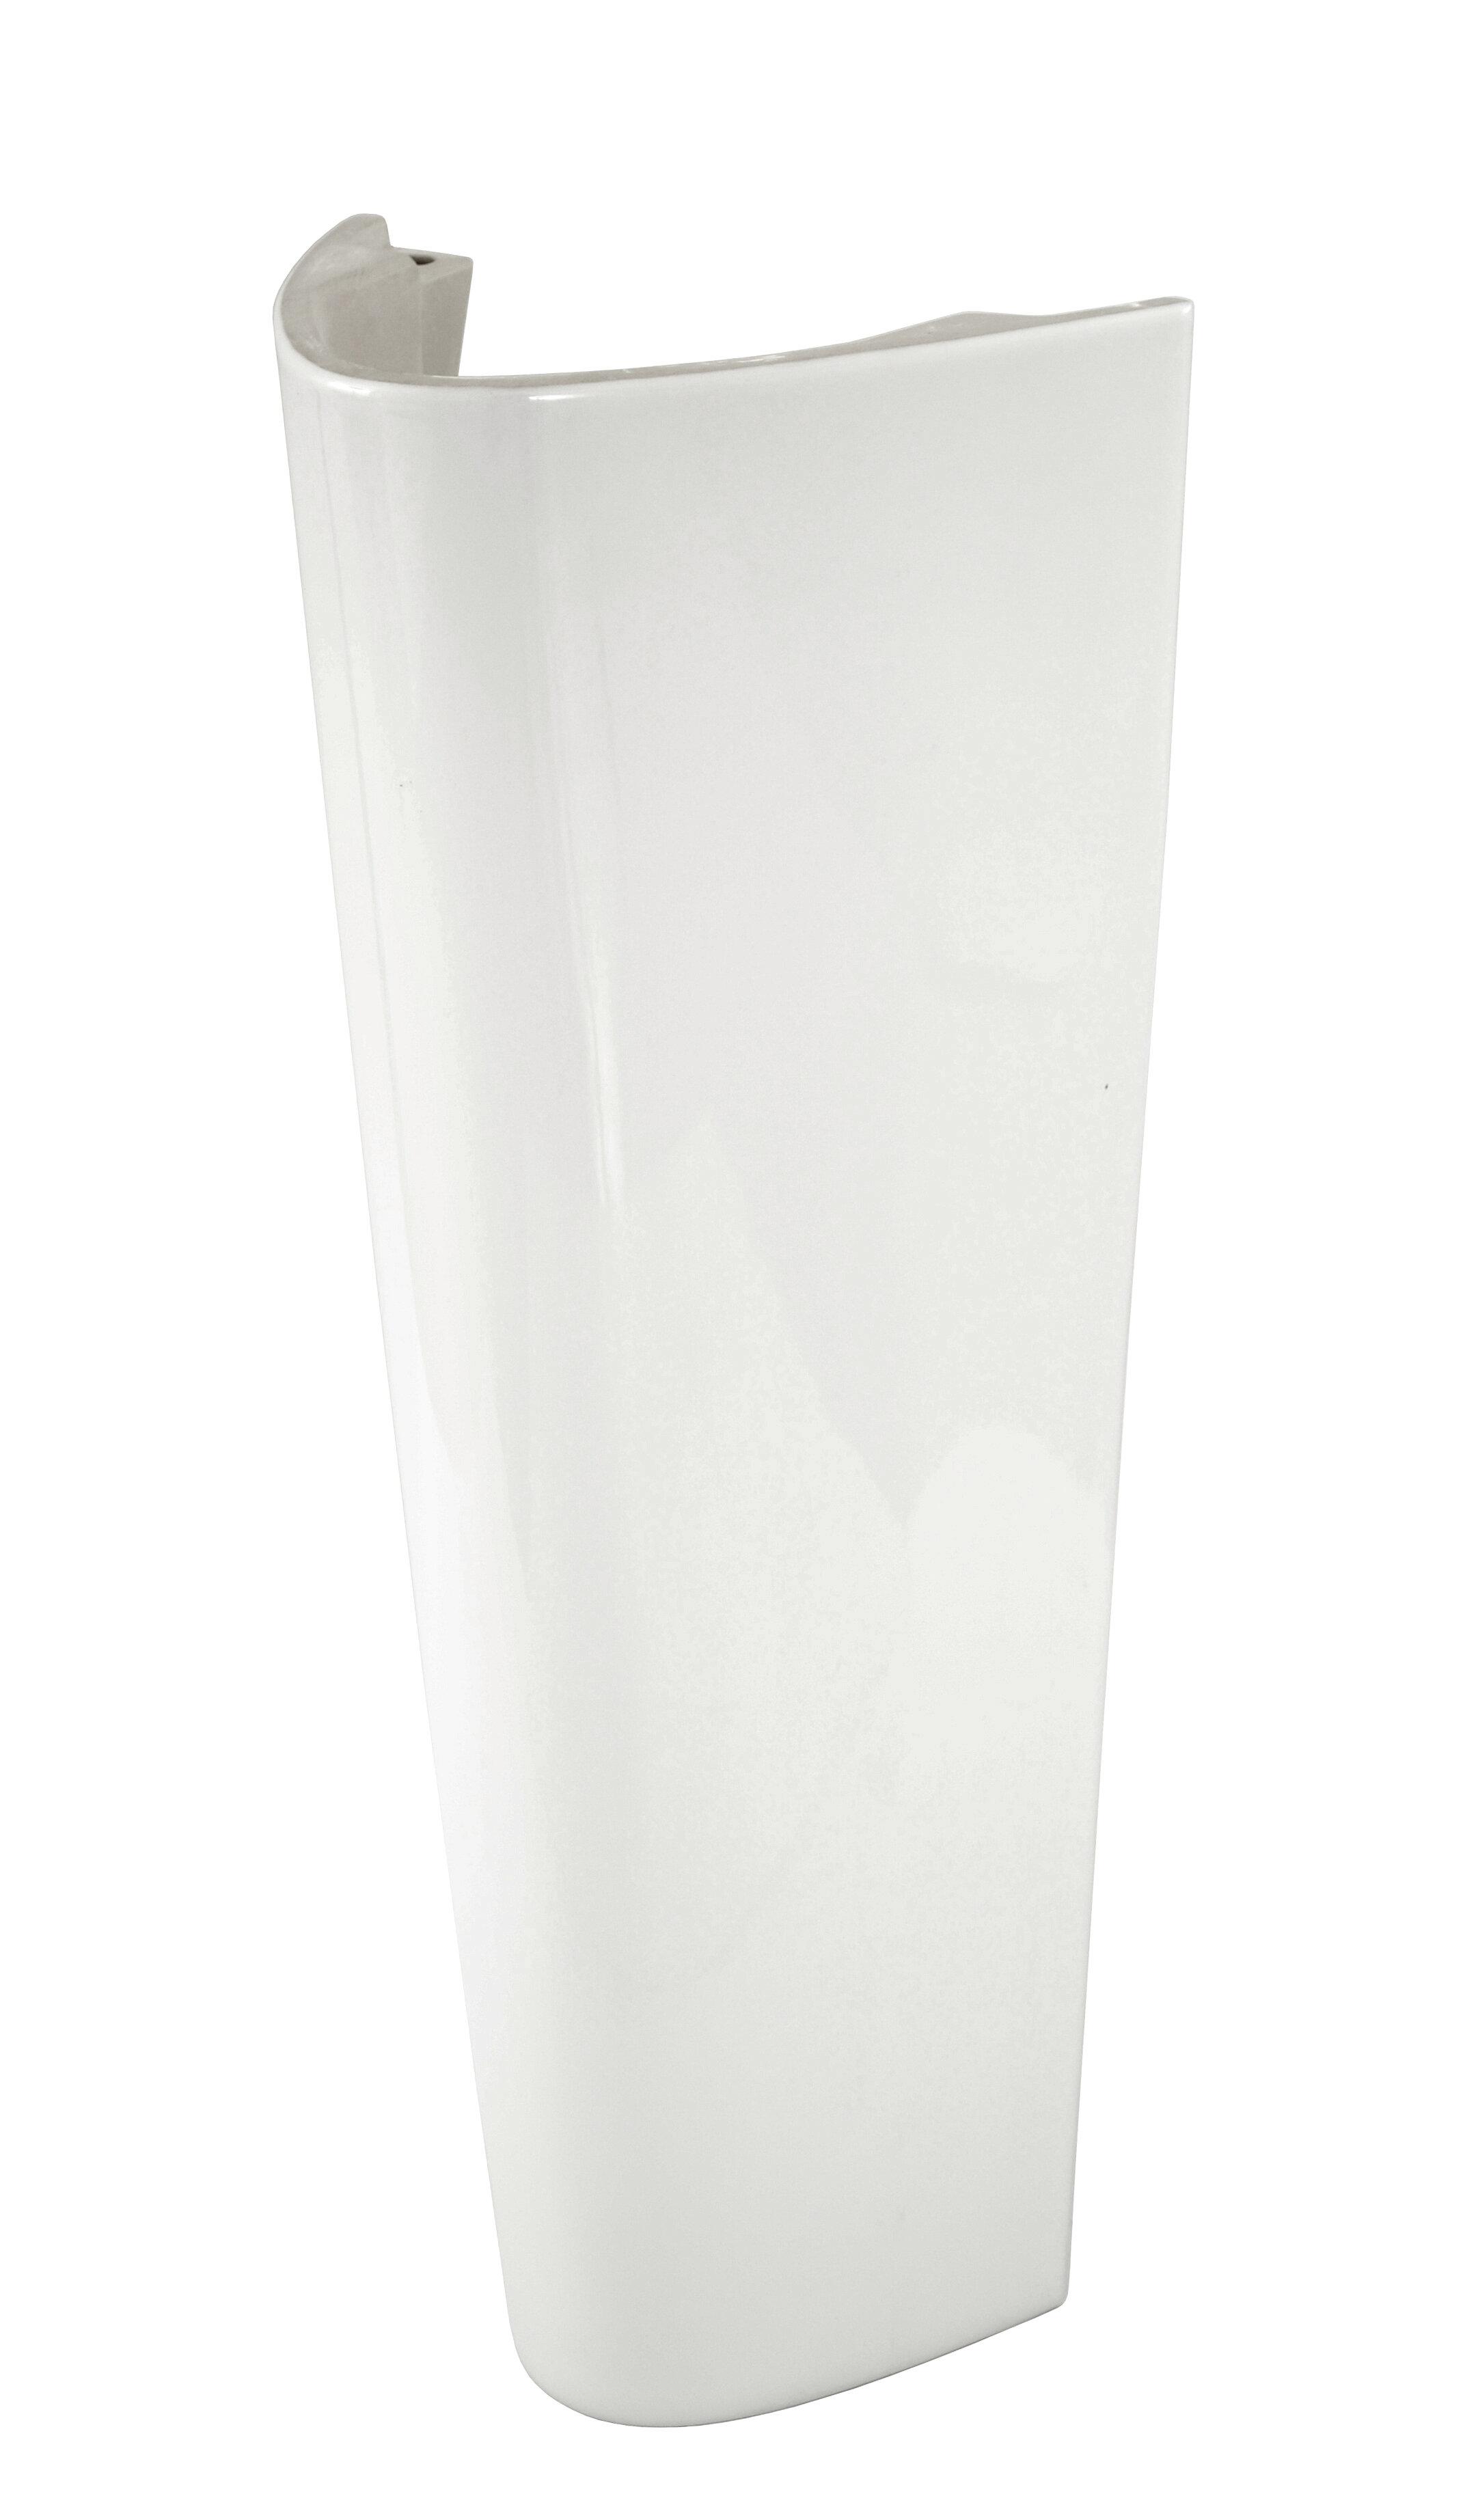 Toto Pacifica Pedestal Bathroom Sink | Wayfair